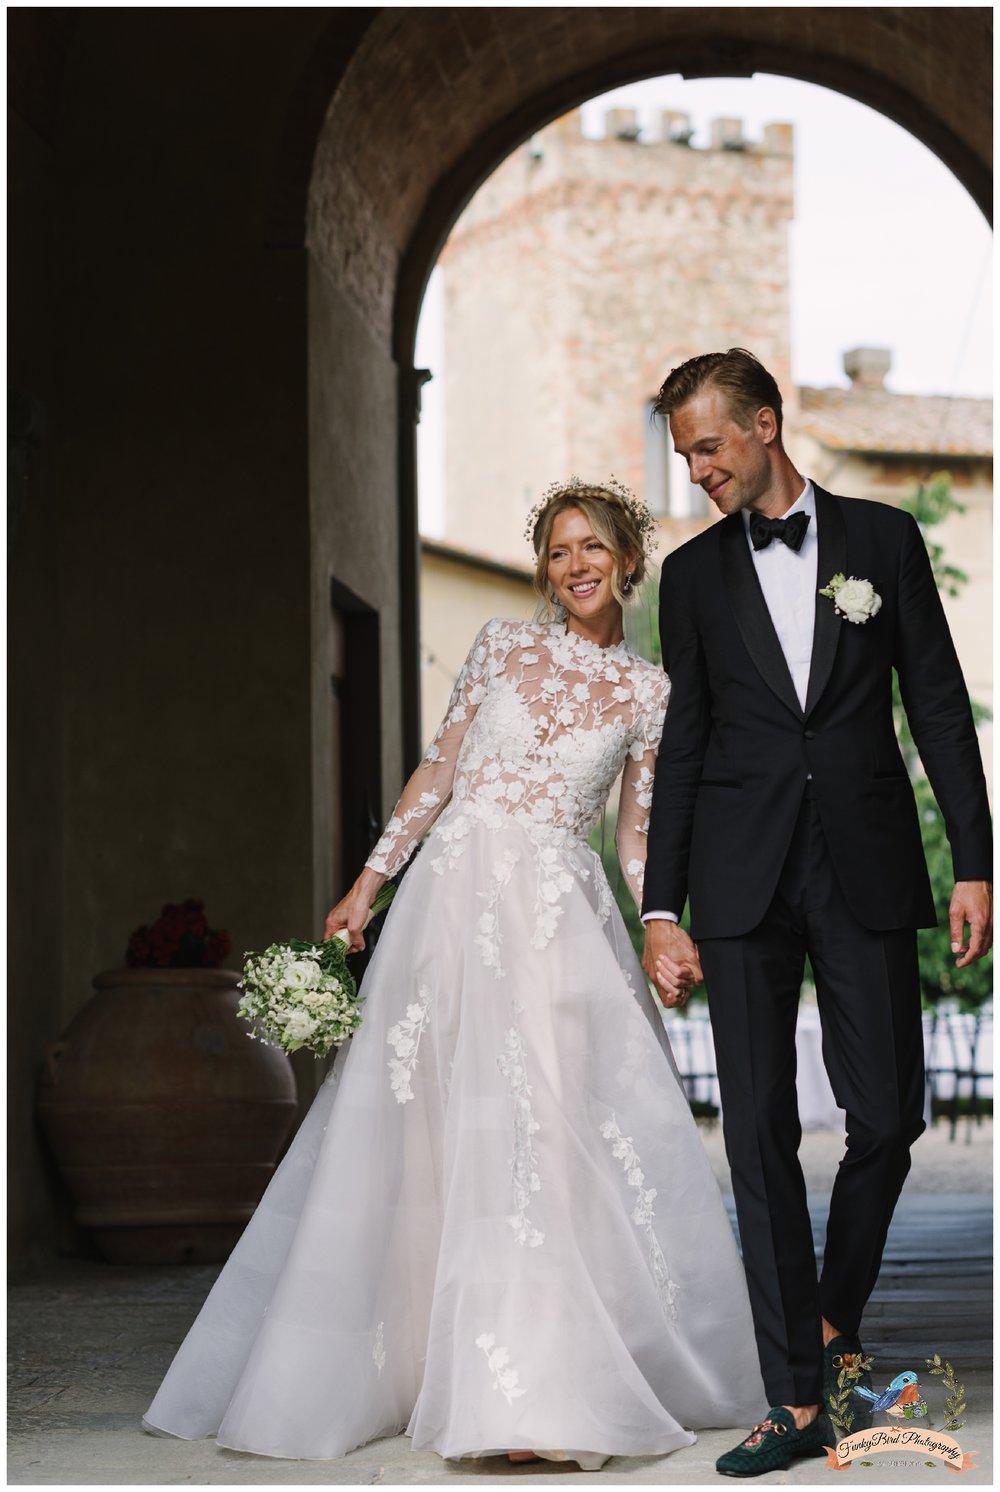 Wedding_Photographer_Tuscany_Bryllupsfotograf_0068.jpg